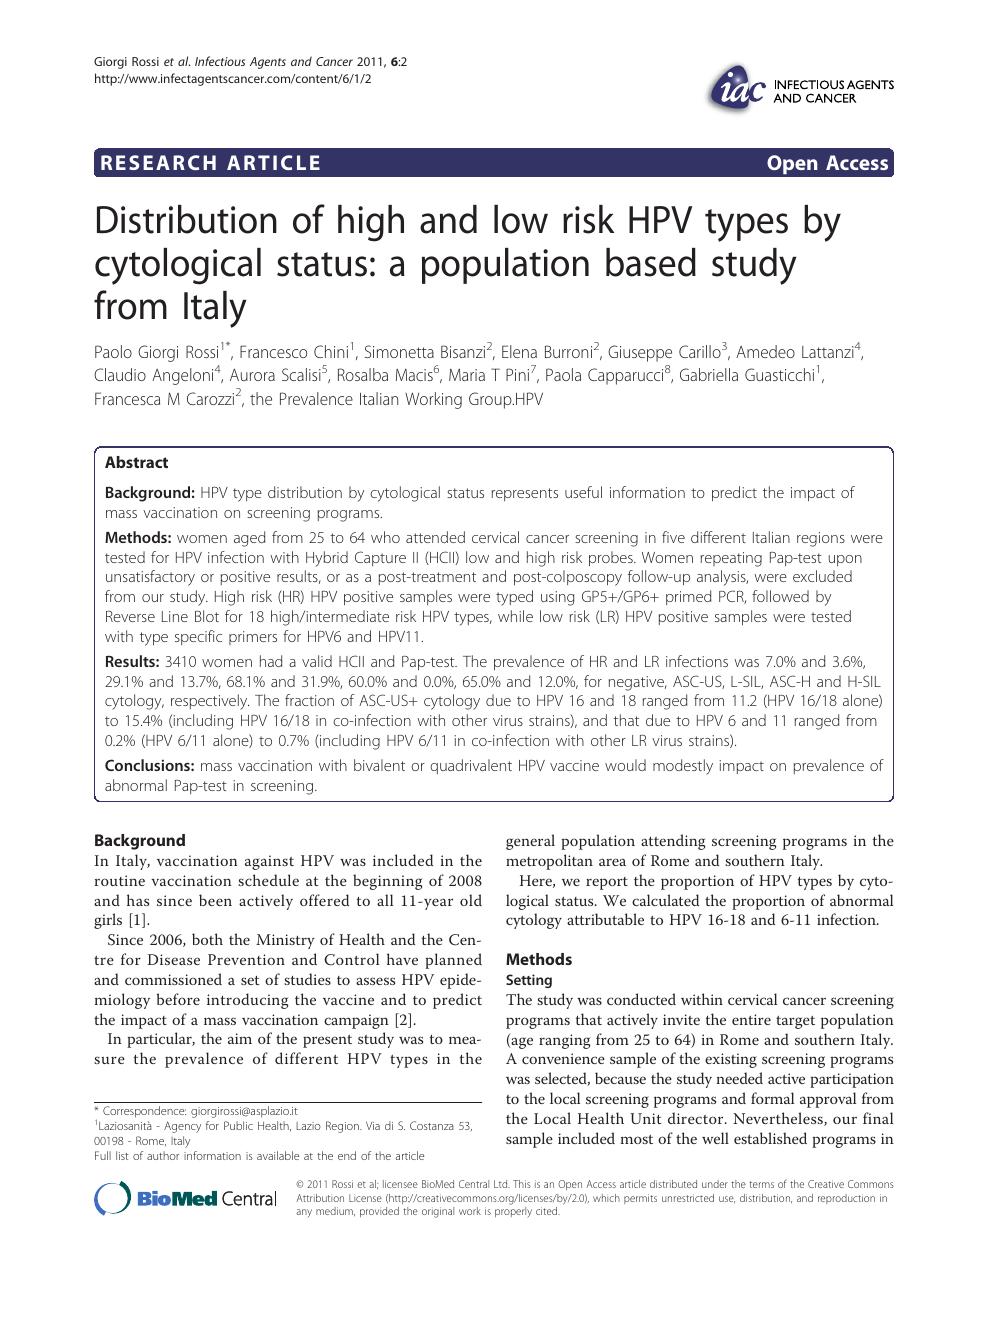 hpv high low risk qiagen la gi papiloma boca